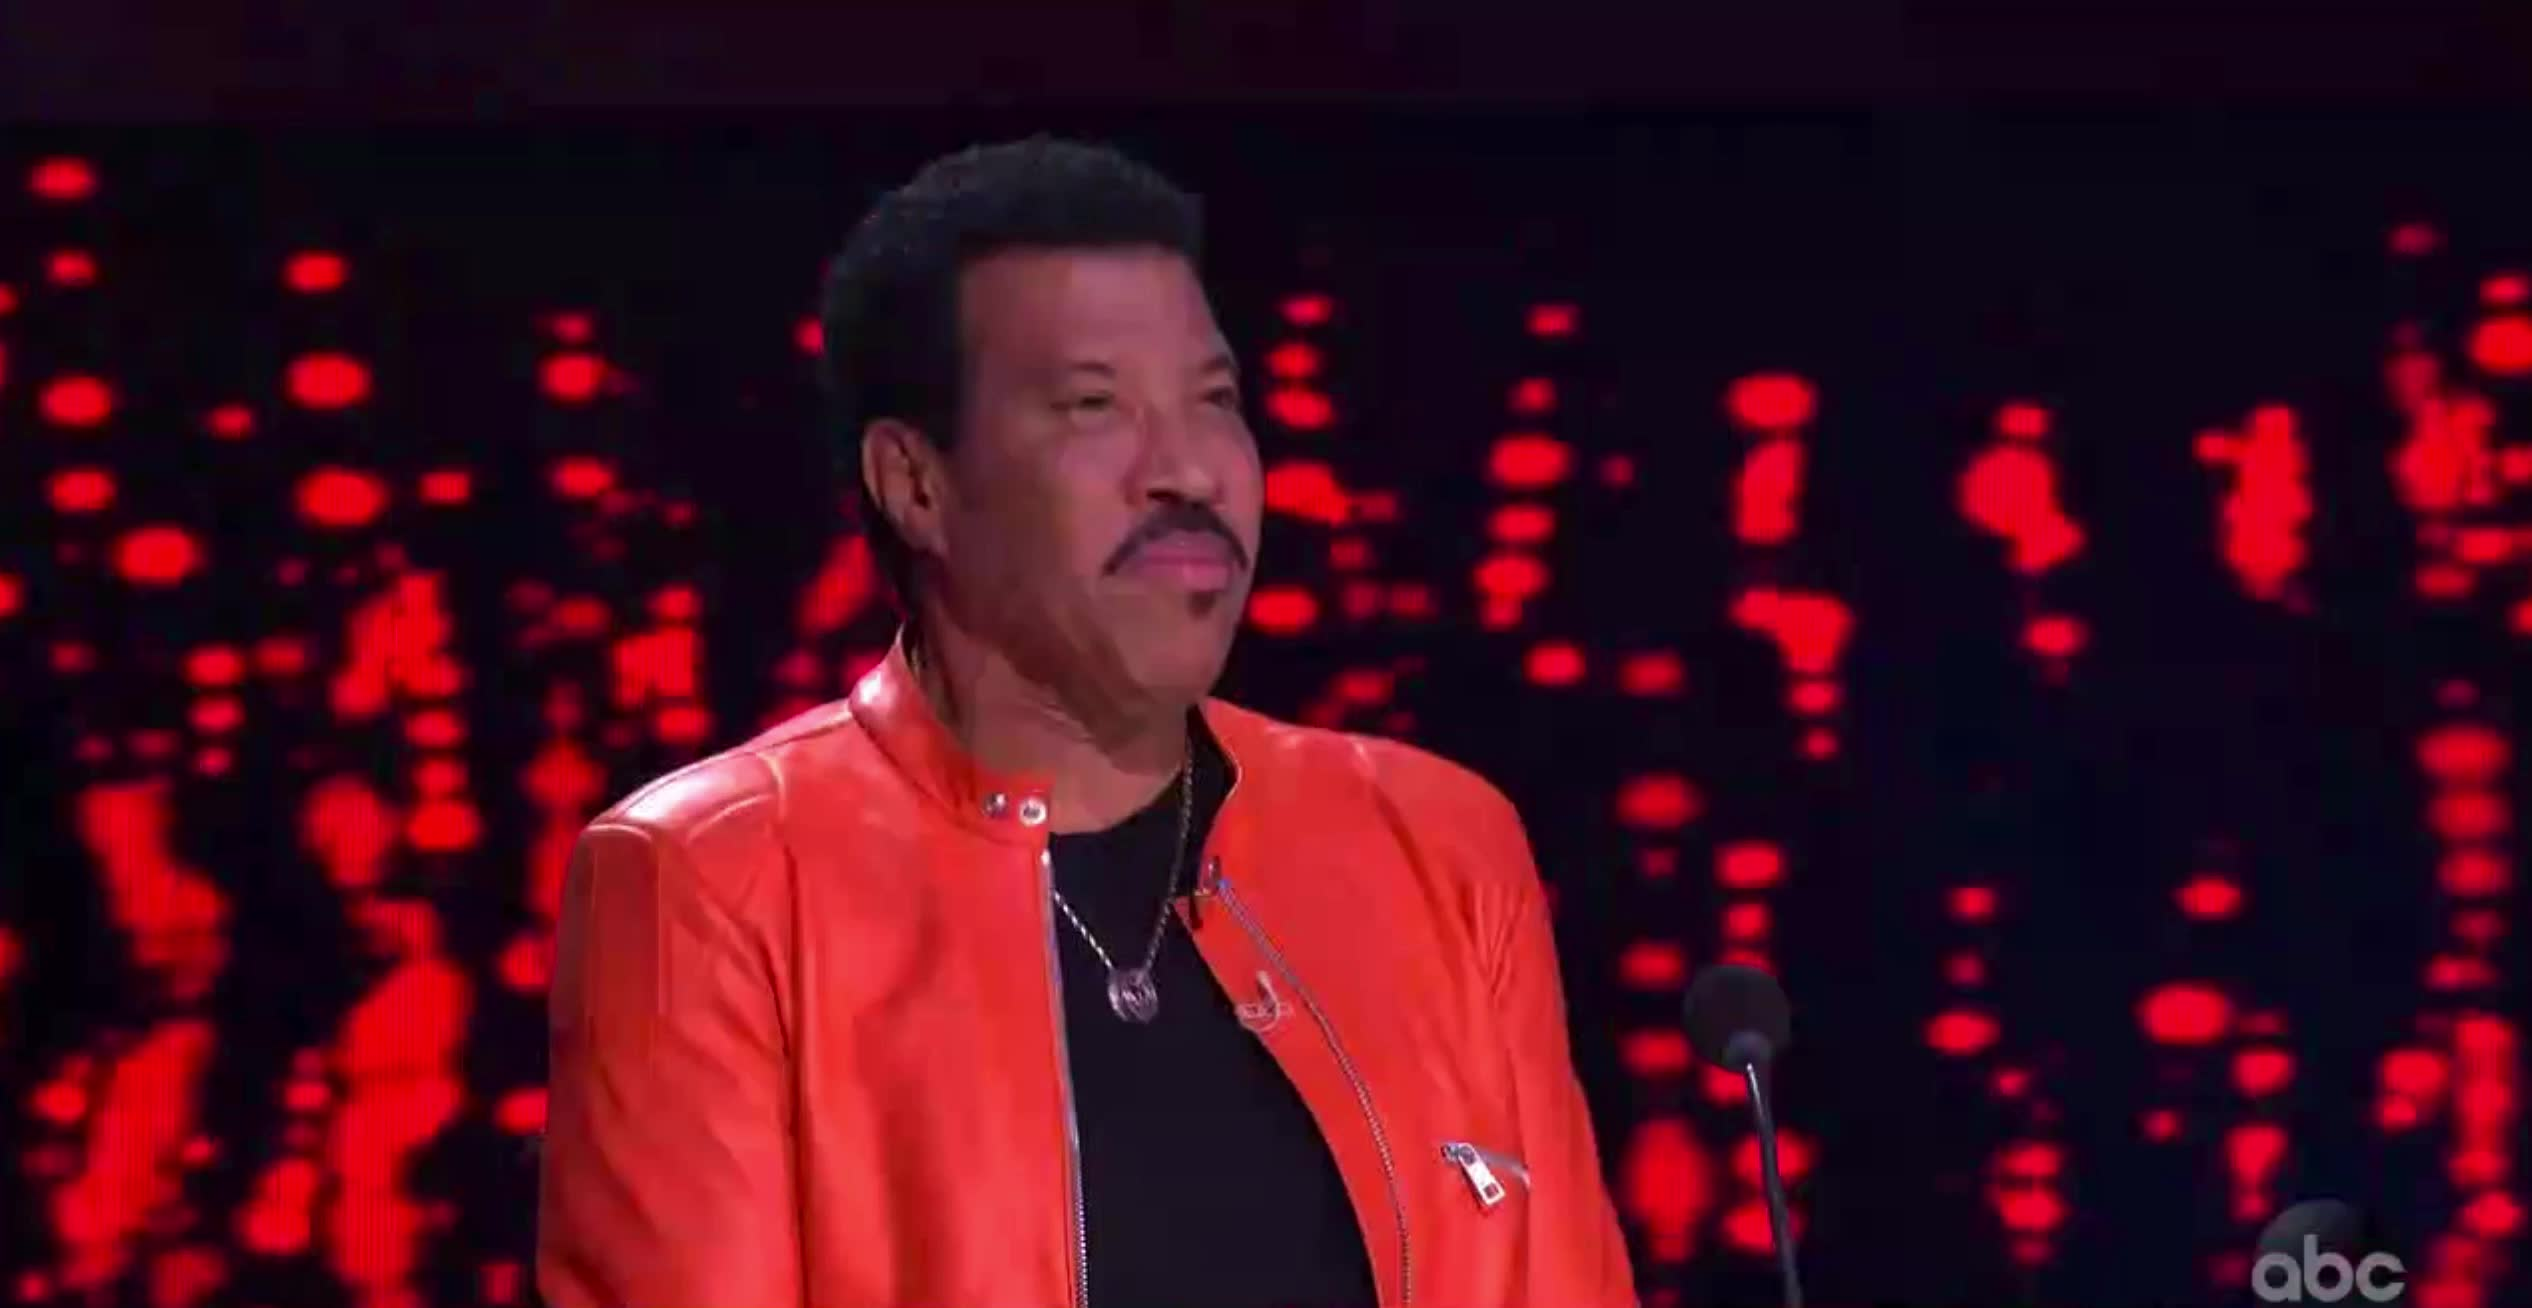 alejandro aranda, american idol, american idol season 17, americanidol, excited, katy perry, lionel richie, luke bryan, ryan seacrest, season 17, American Idol Lionel Feeling Alejandro's Performance GIFs